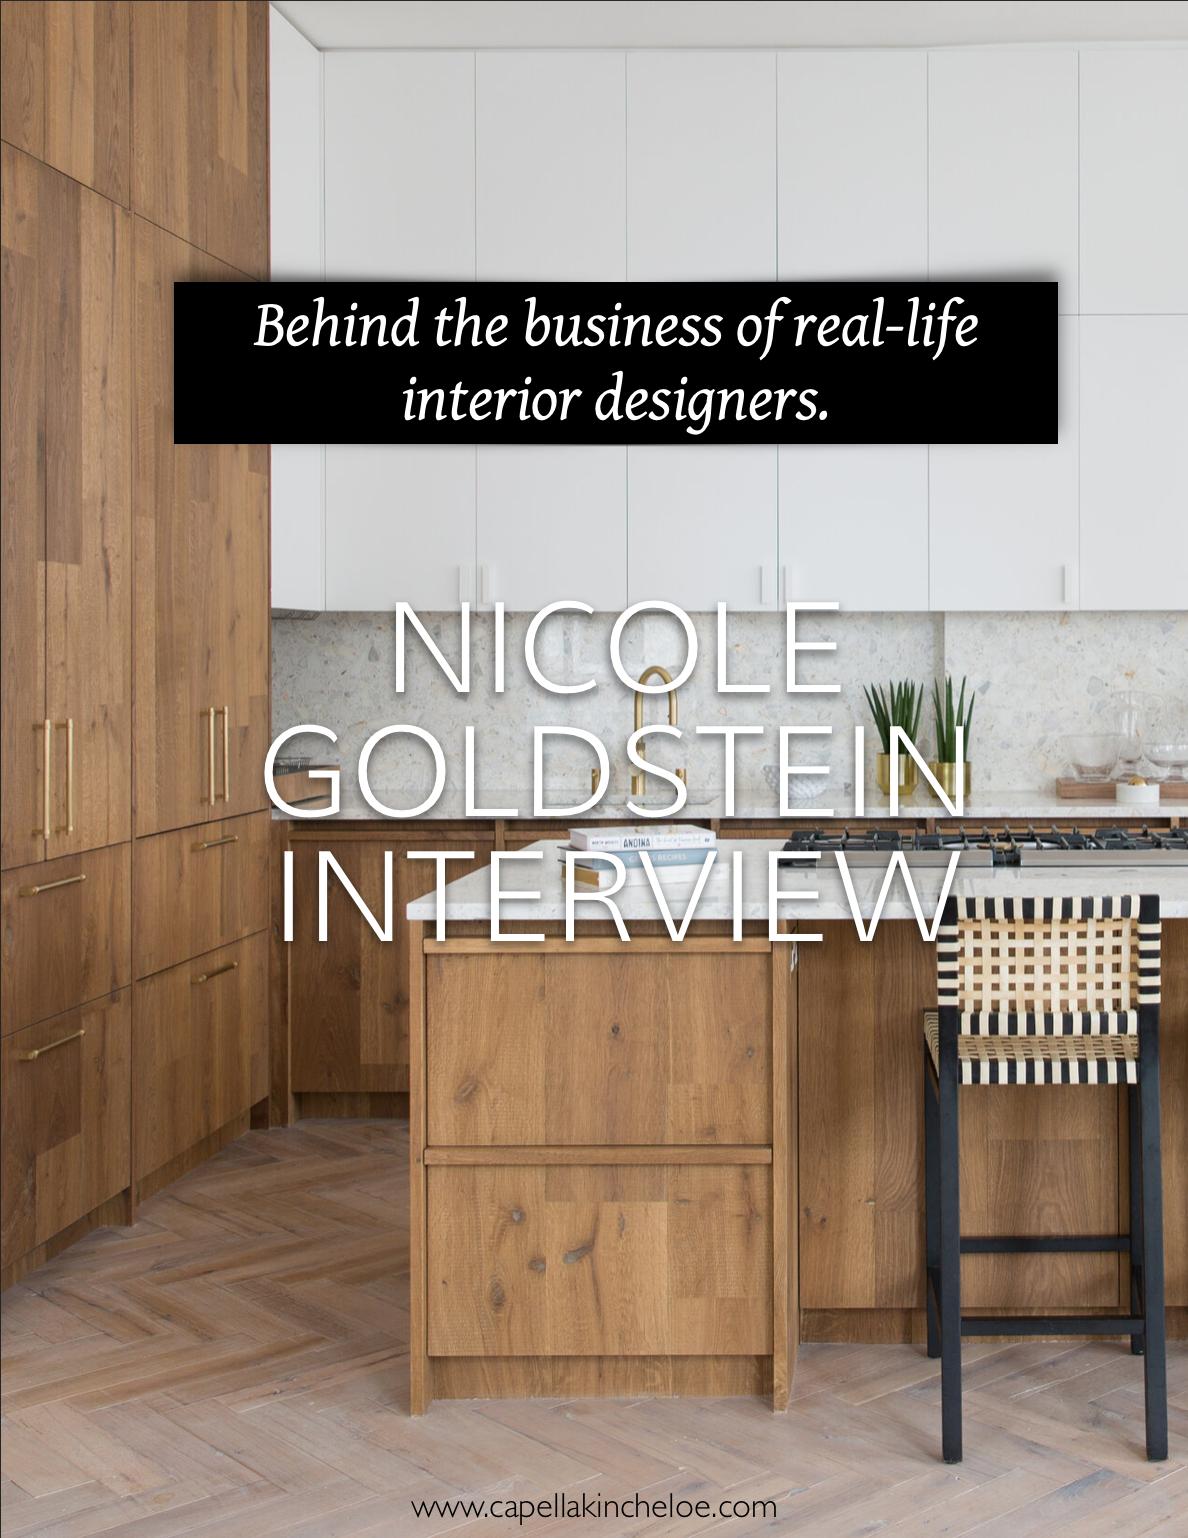 Real Designer Nicole Goldstein In 2020 Interior Design Business